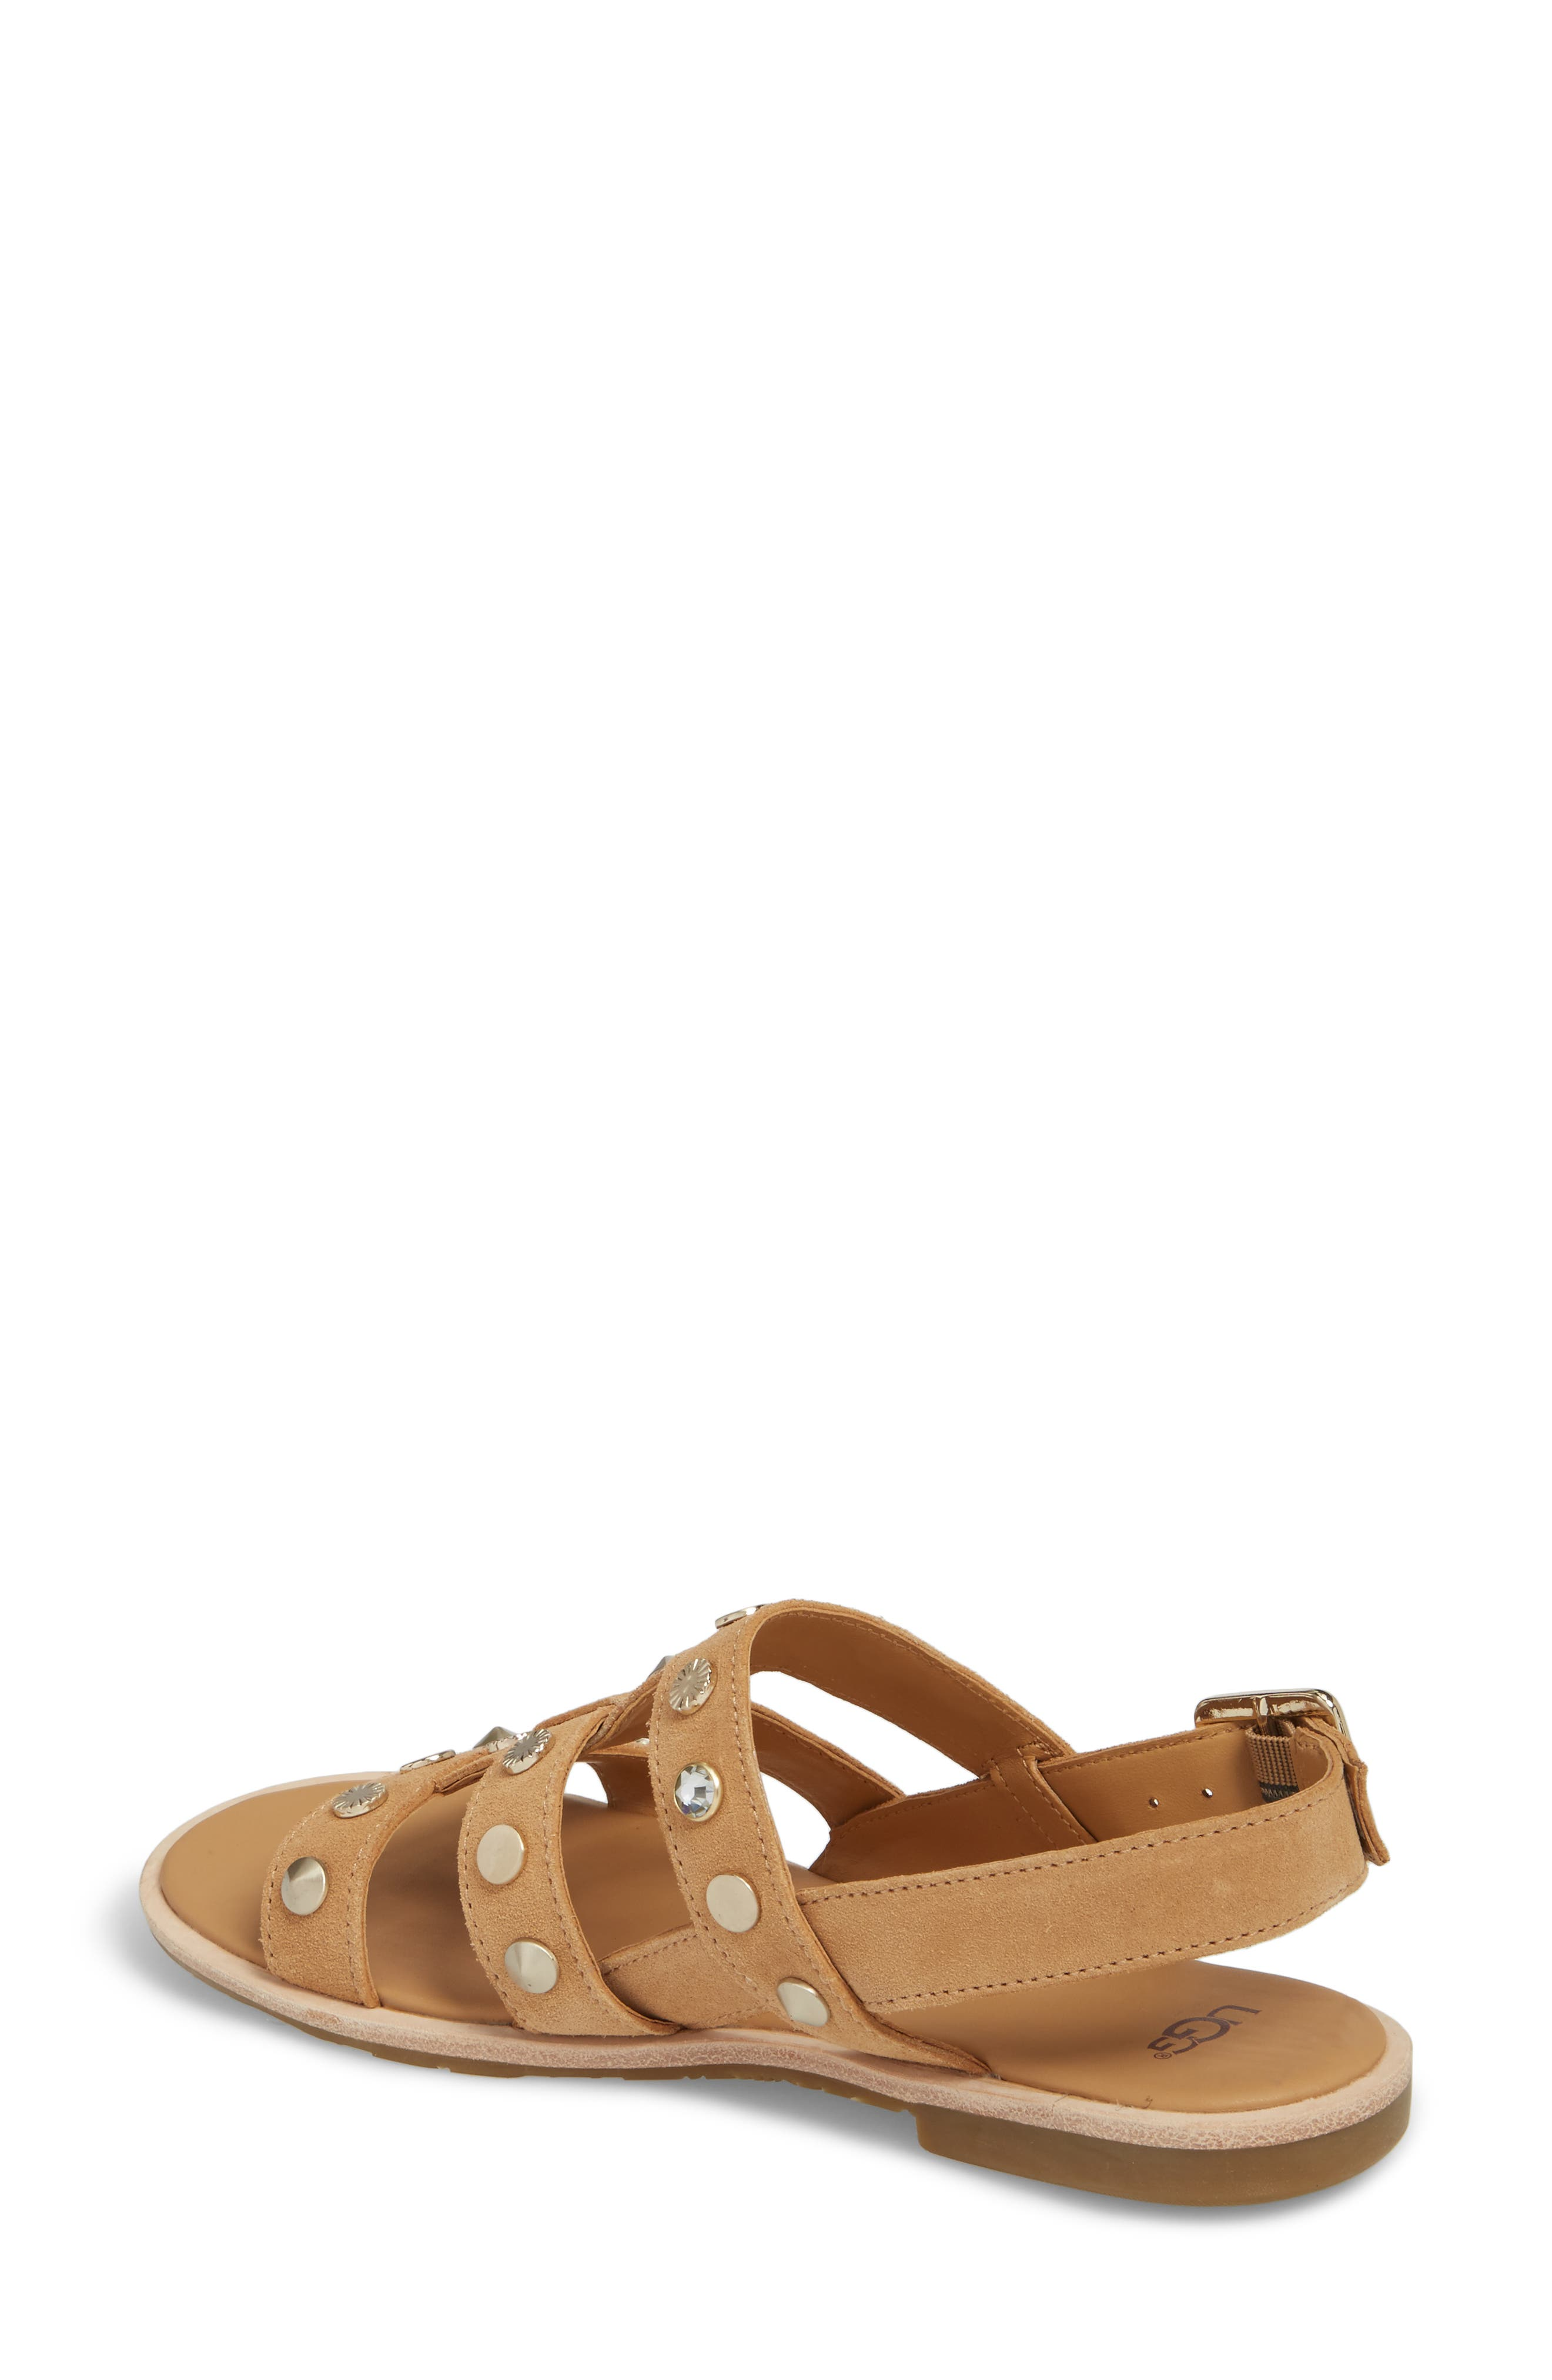 Zariah Studded Sandal,                             Alternate thumbnail 2, color,                             Latte Suede